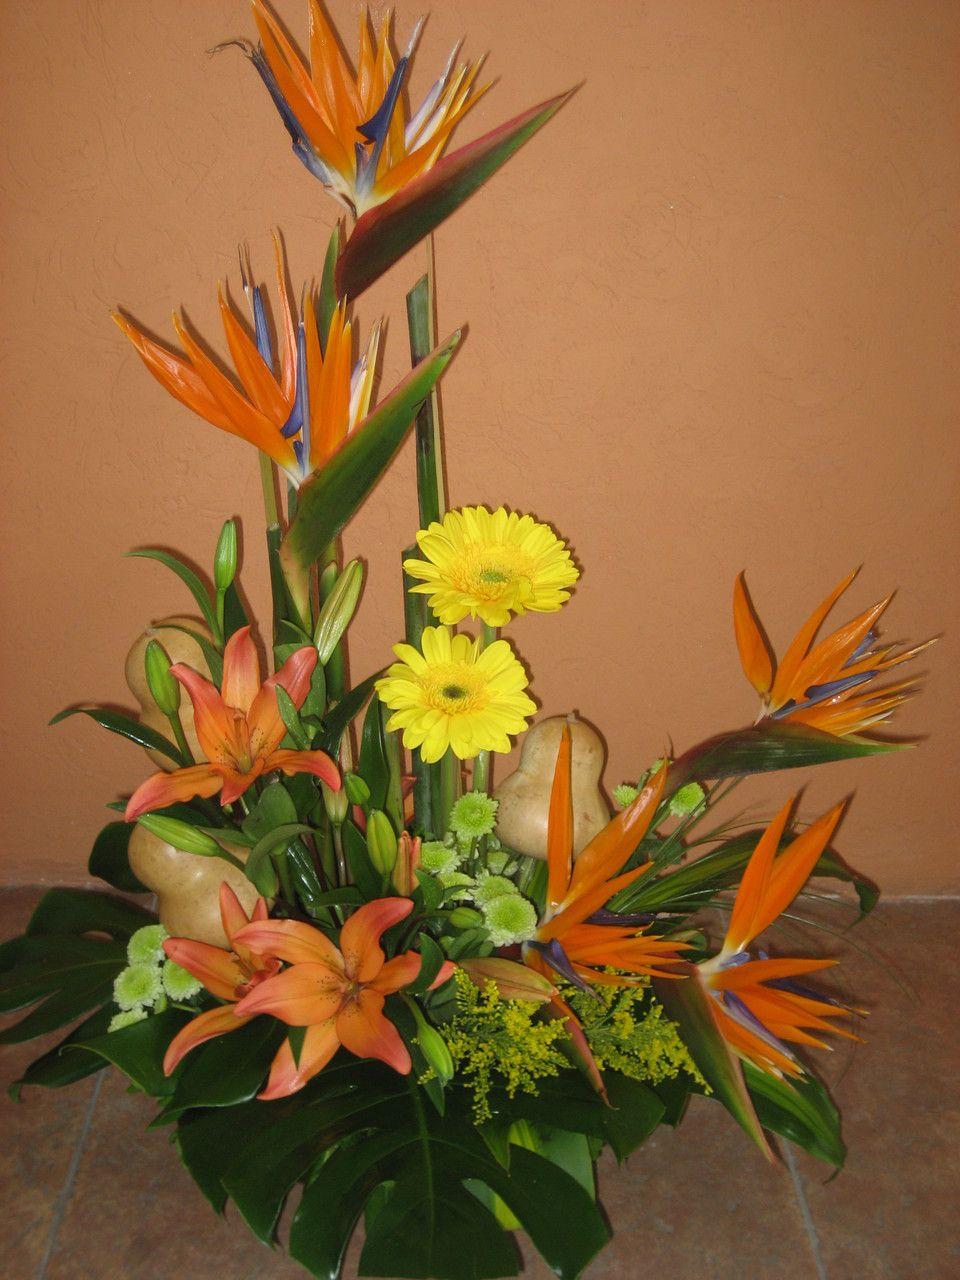 Disenos Florales Floreria Cattleya En Nuevo Vallarta Cattleya Flower Shop We Are Located At Bucerias Tropical Flower Arrangements Floral Arrangements Flower Arrangements